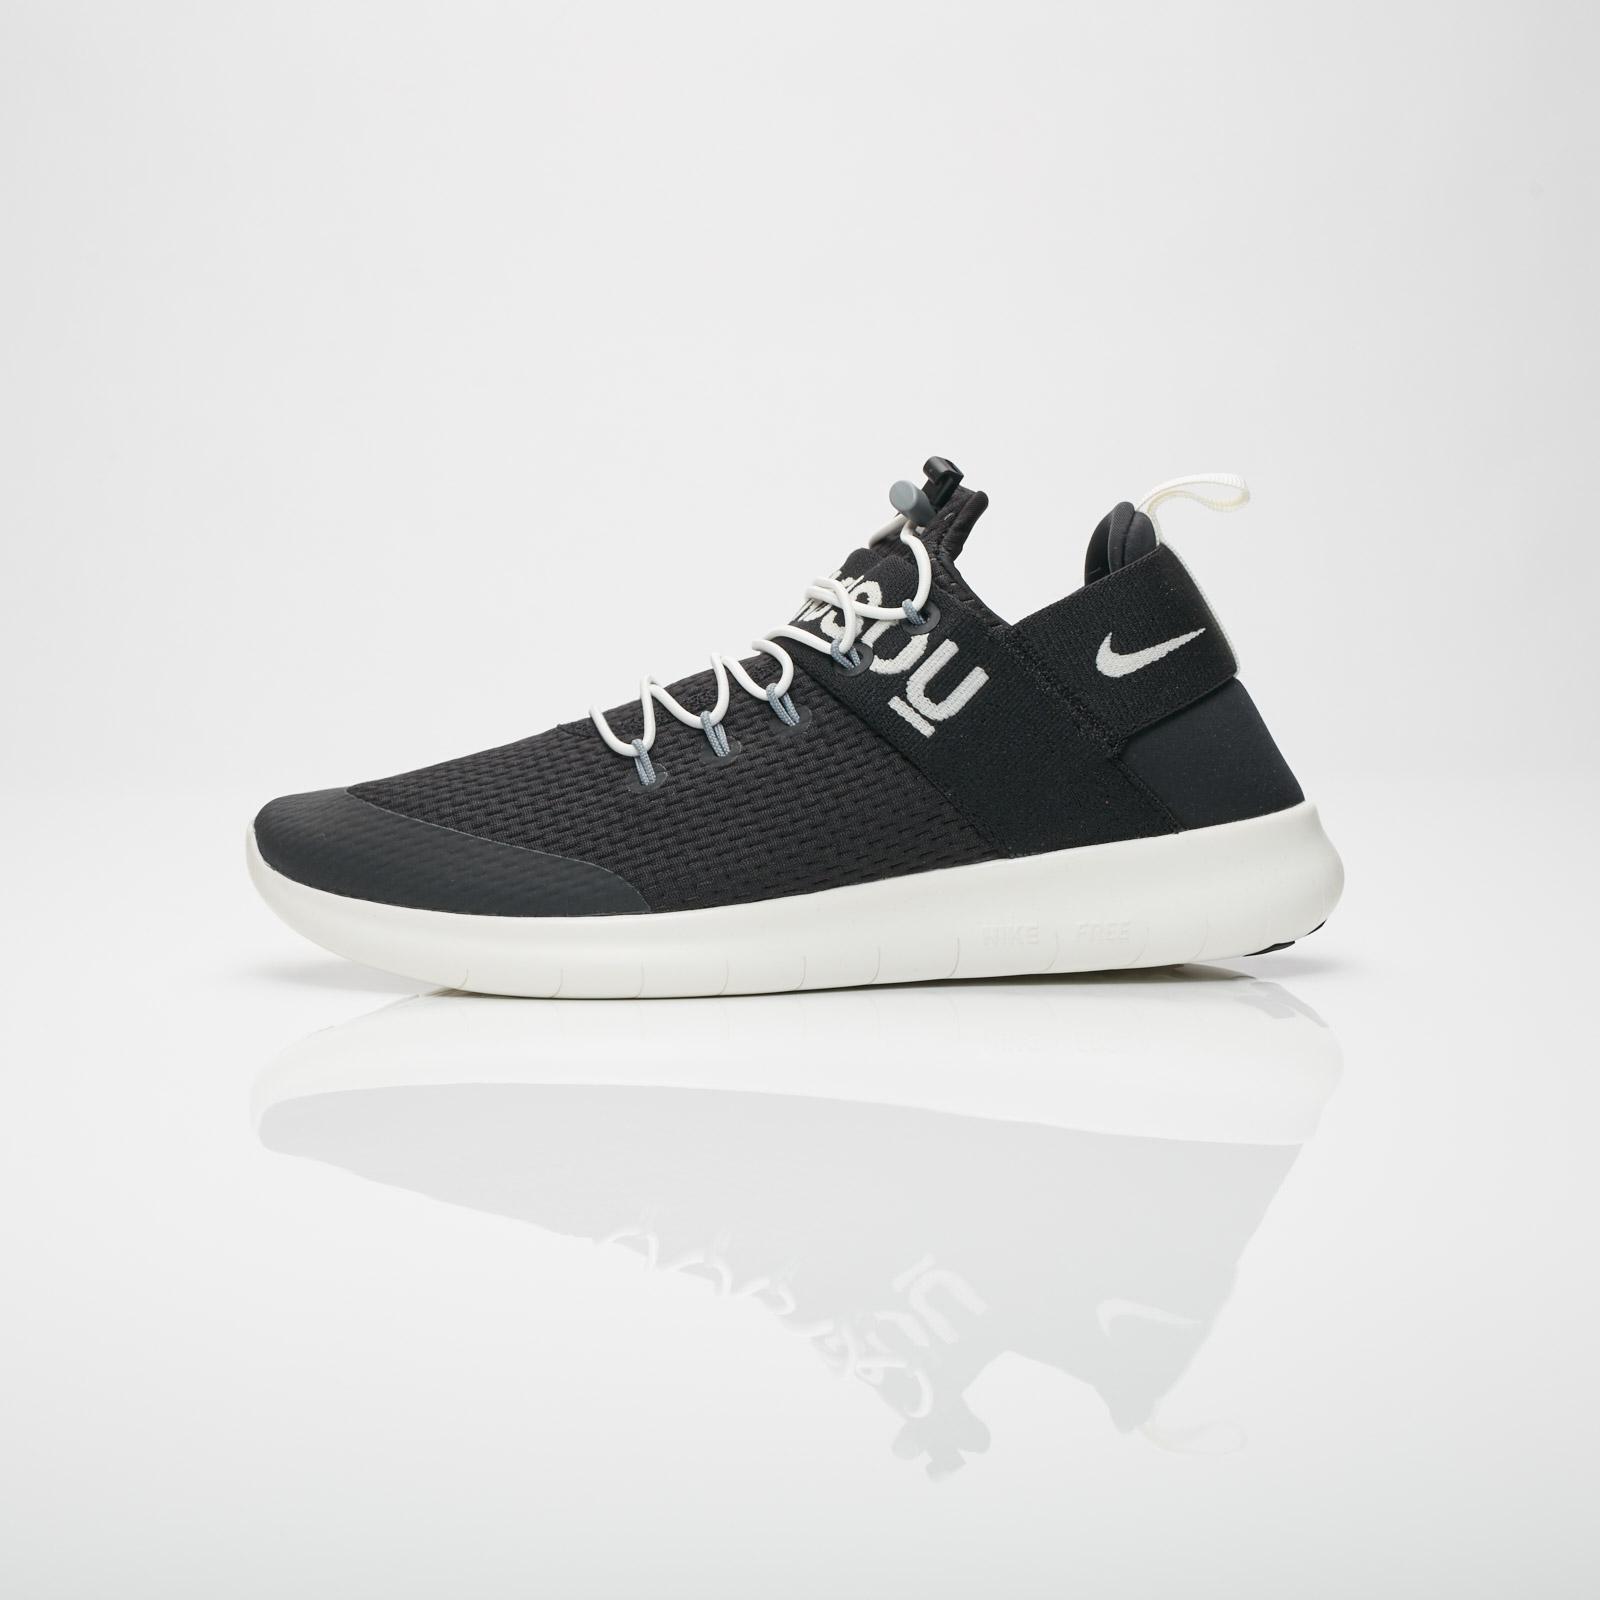 8b65462d7a6 Nike Free Run CMTR 2017 - 904732-001 - Sneakersnstuff